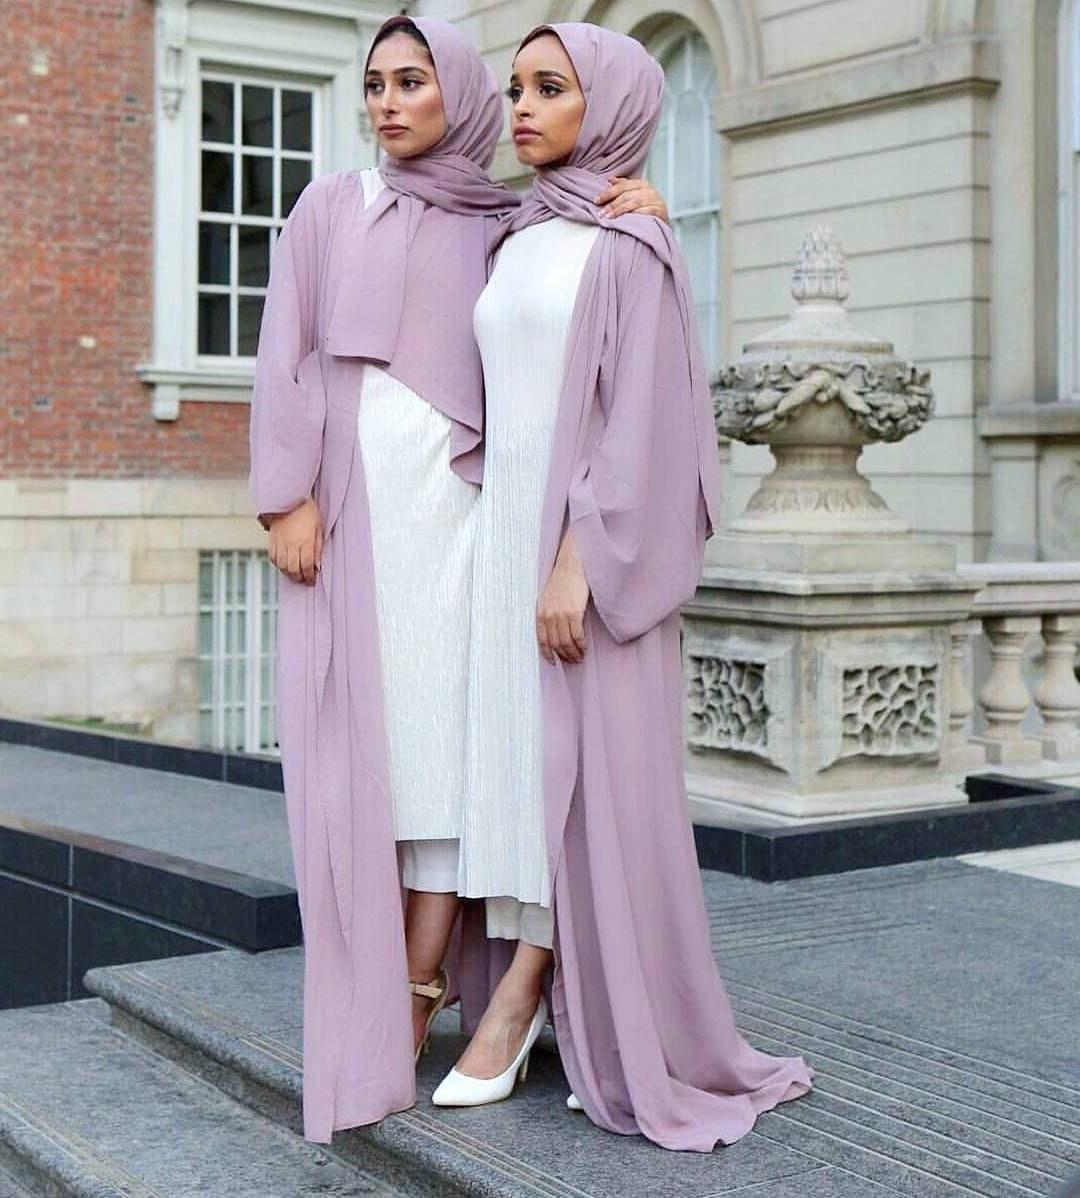 Model Referensi Baju Lebaran Zwd9 50 Model Baju Lebaran Terbaru 2018 Modern & Elegan